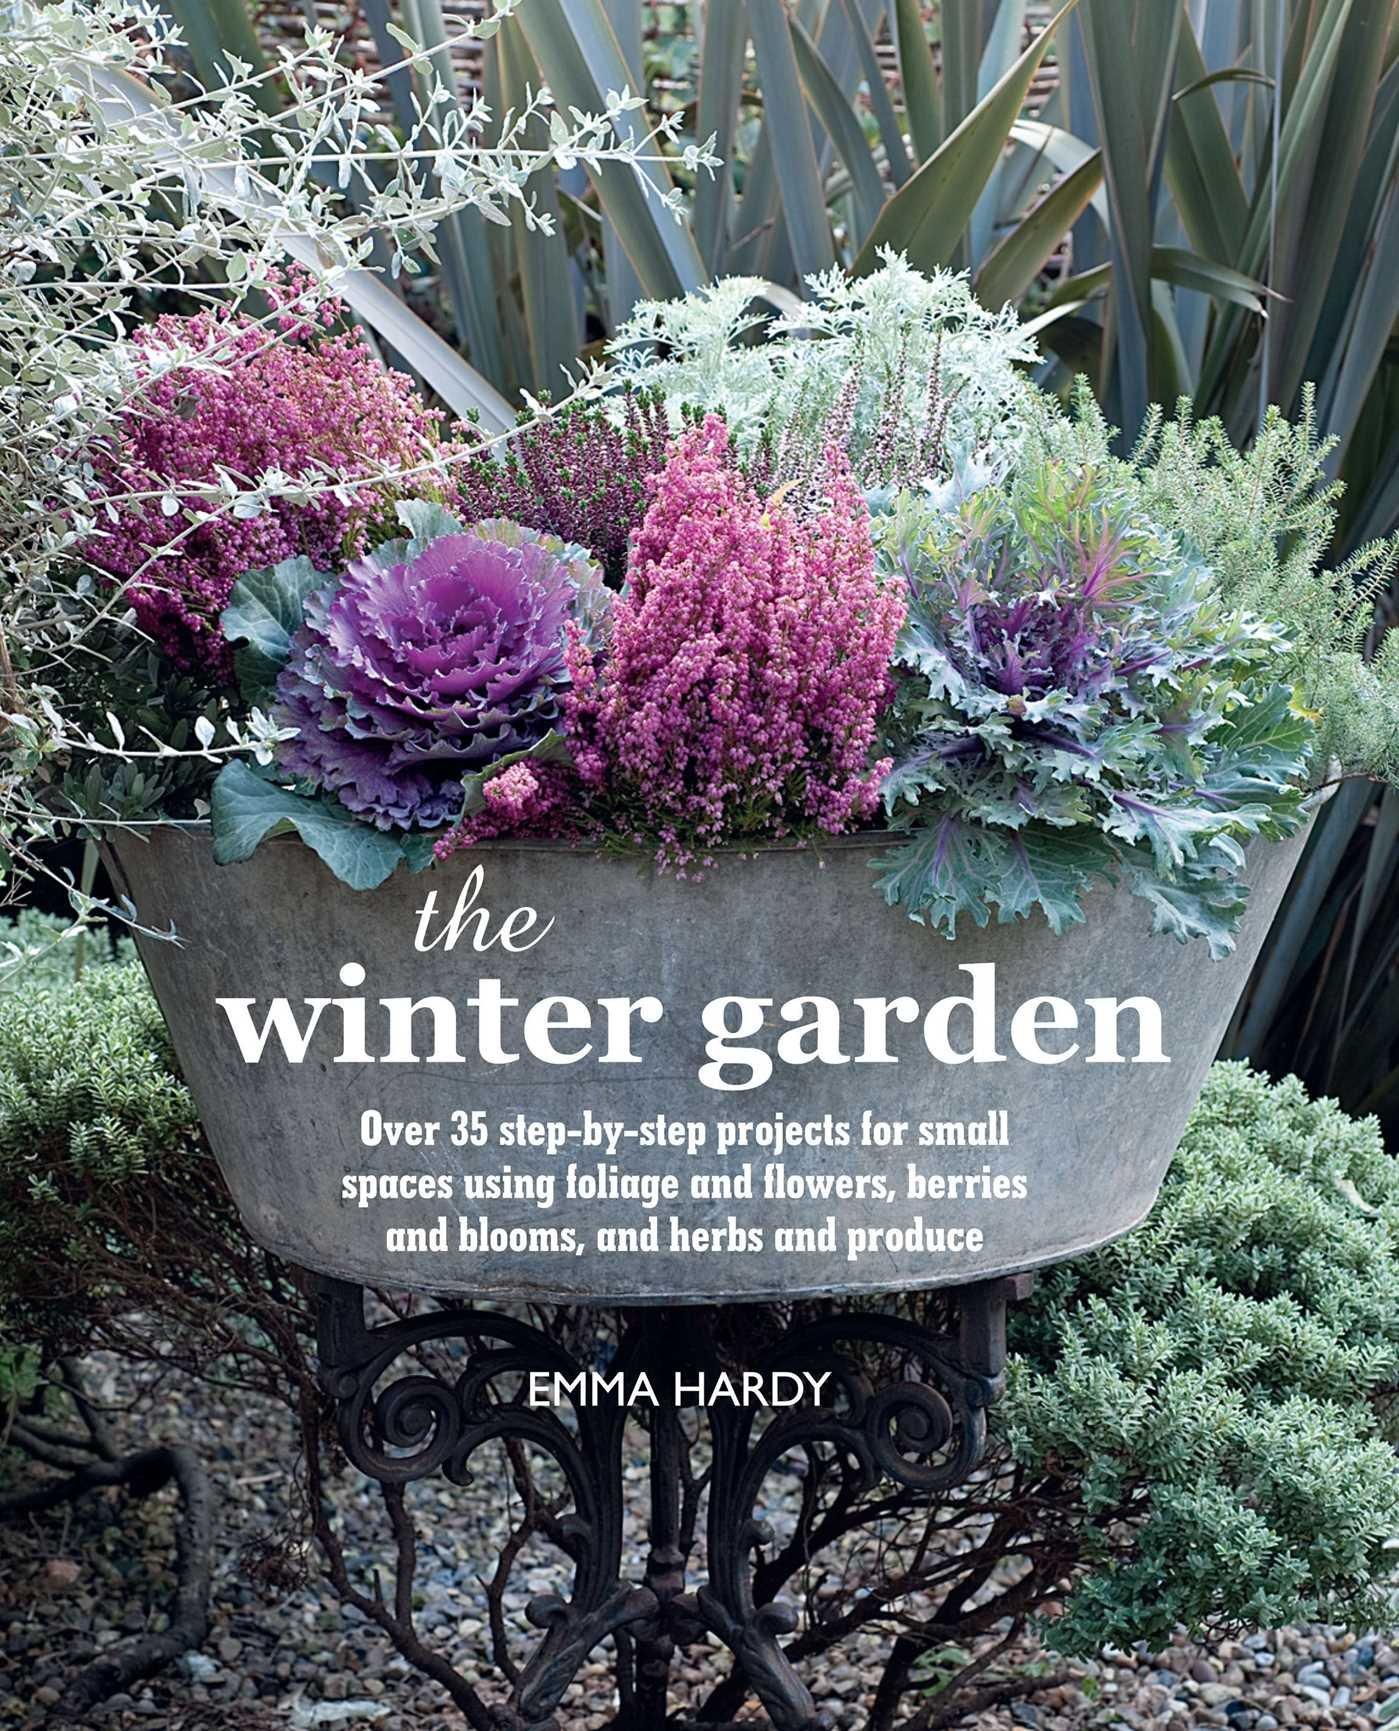 Flowering ornamental plants in winter - the best photos